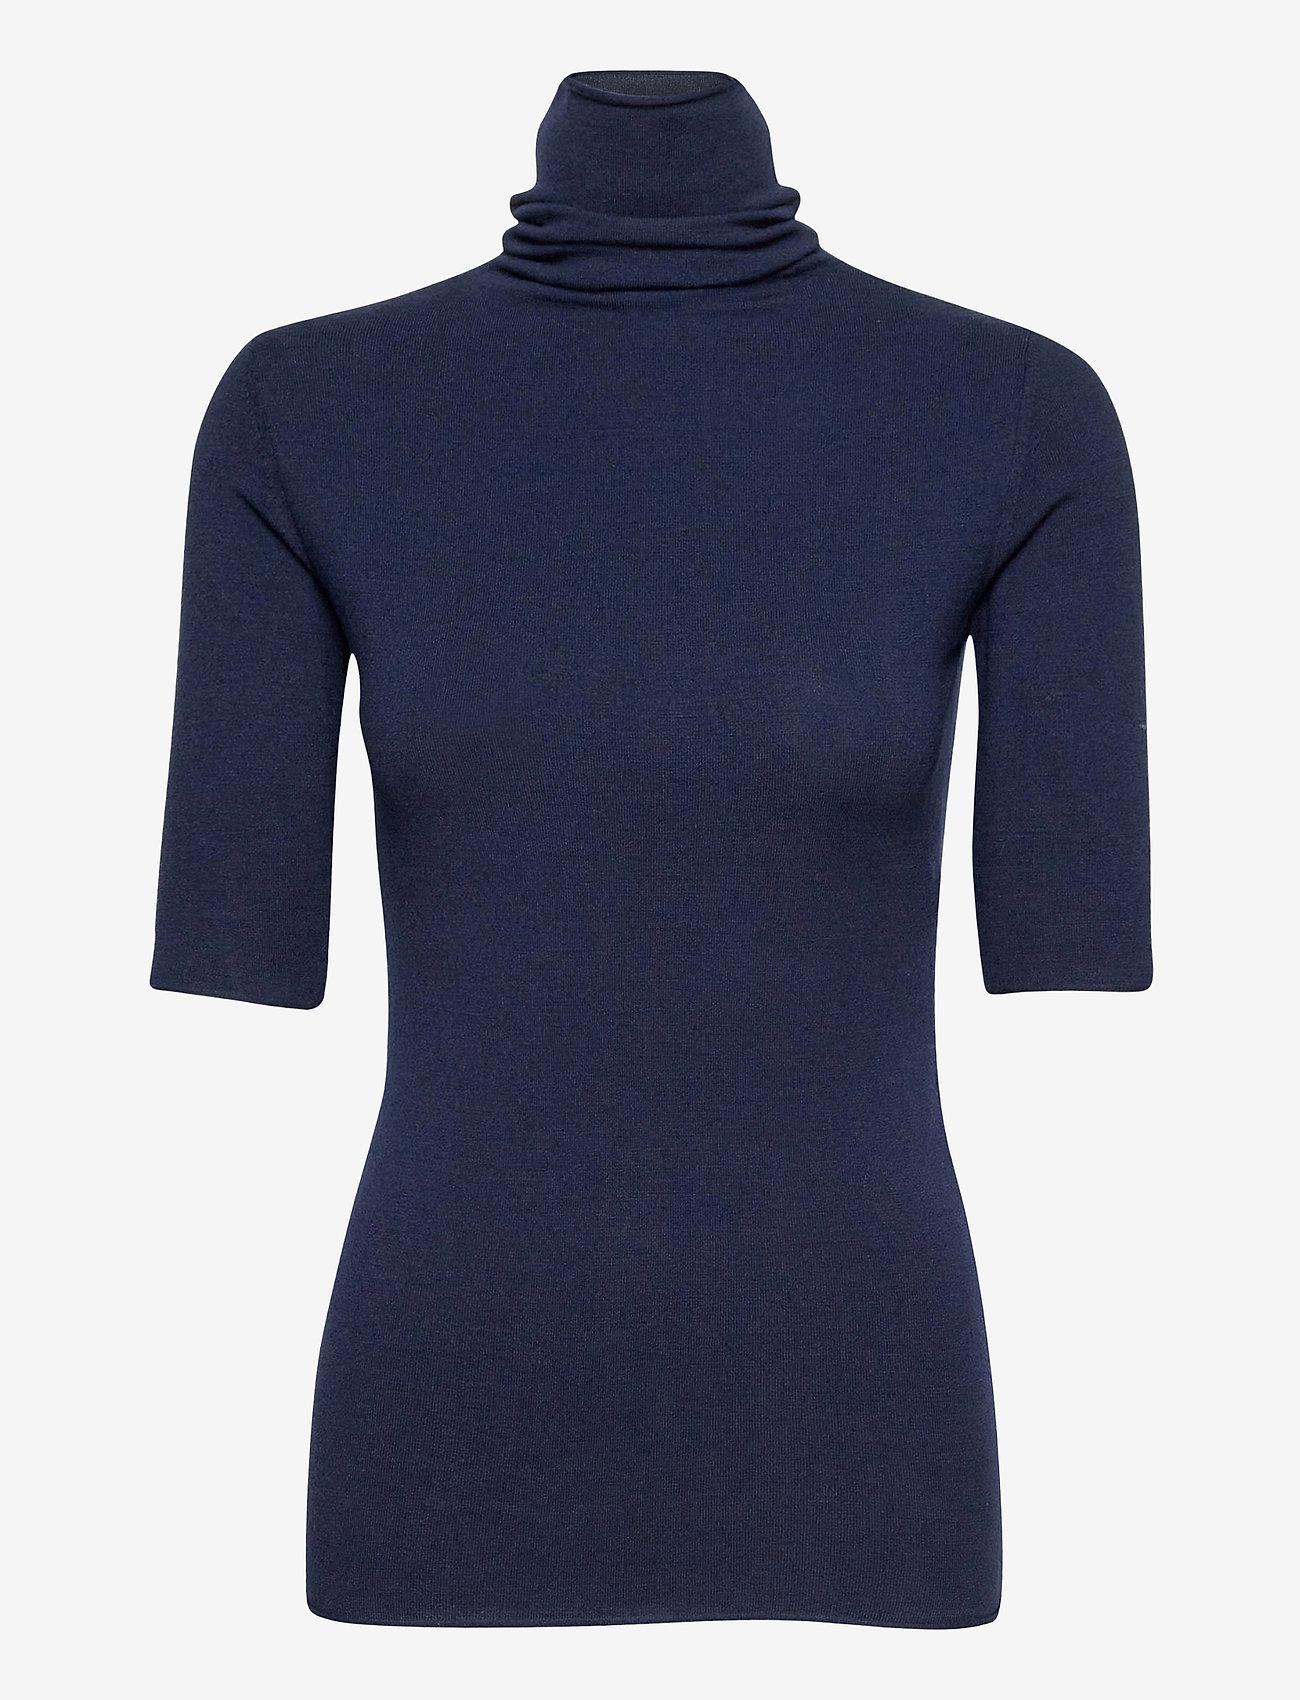 Max&Co. - DADO - gebreide t-shirts - lyra blue - 0